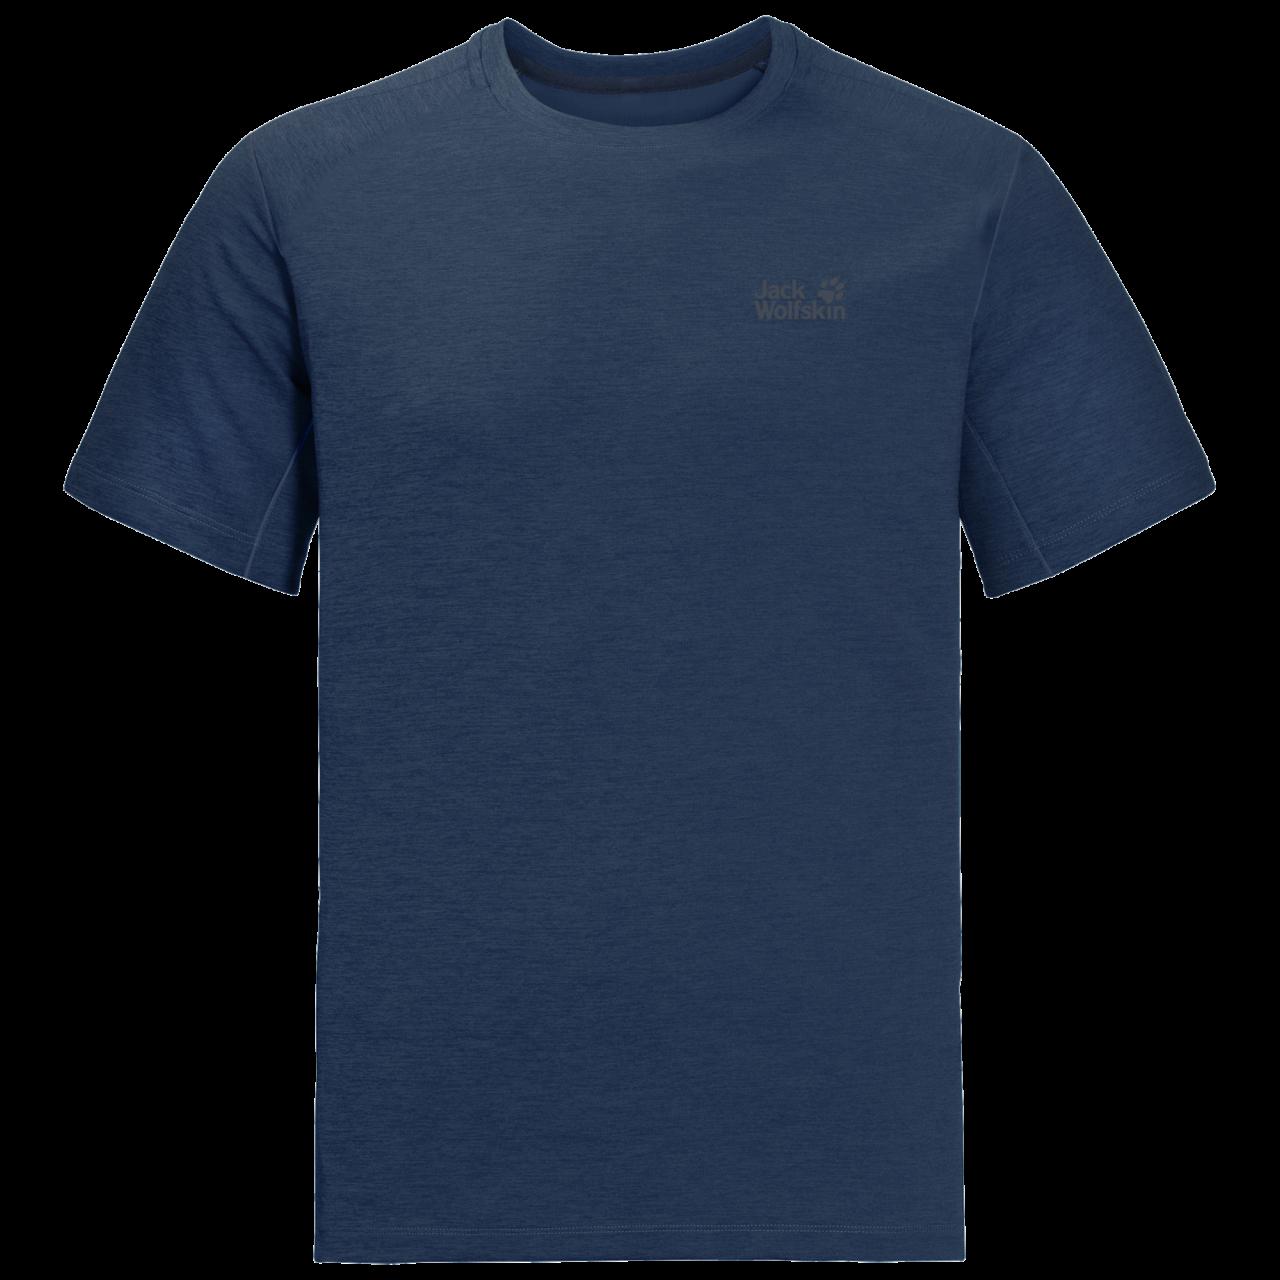 Jack Wolfskin Hydropore T-Shirt Heren